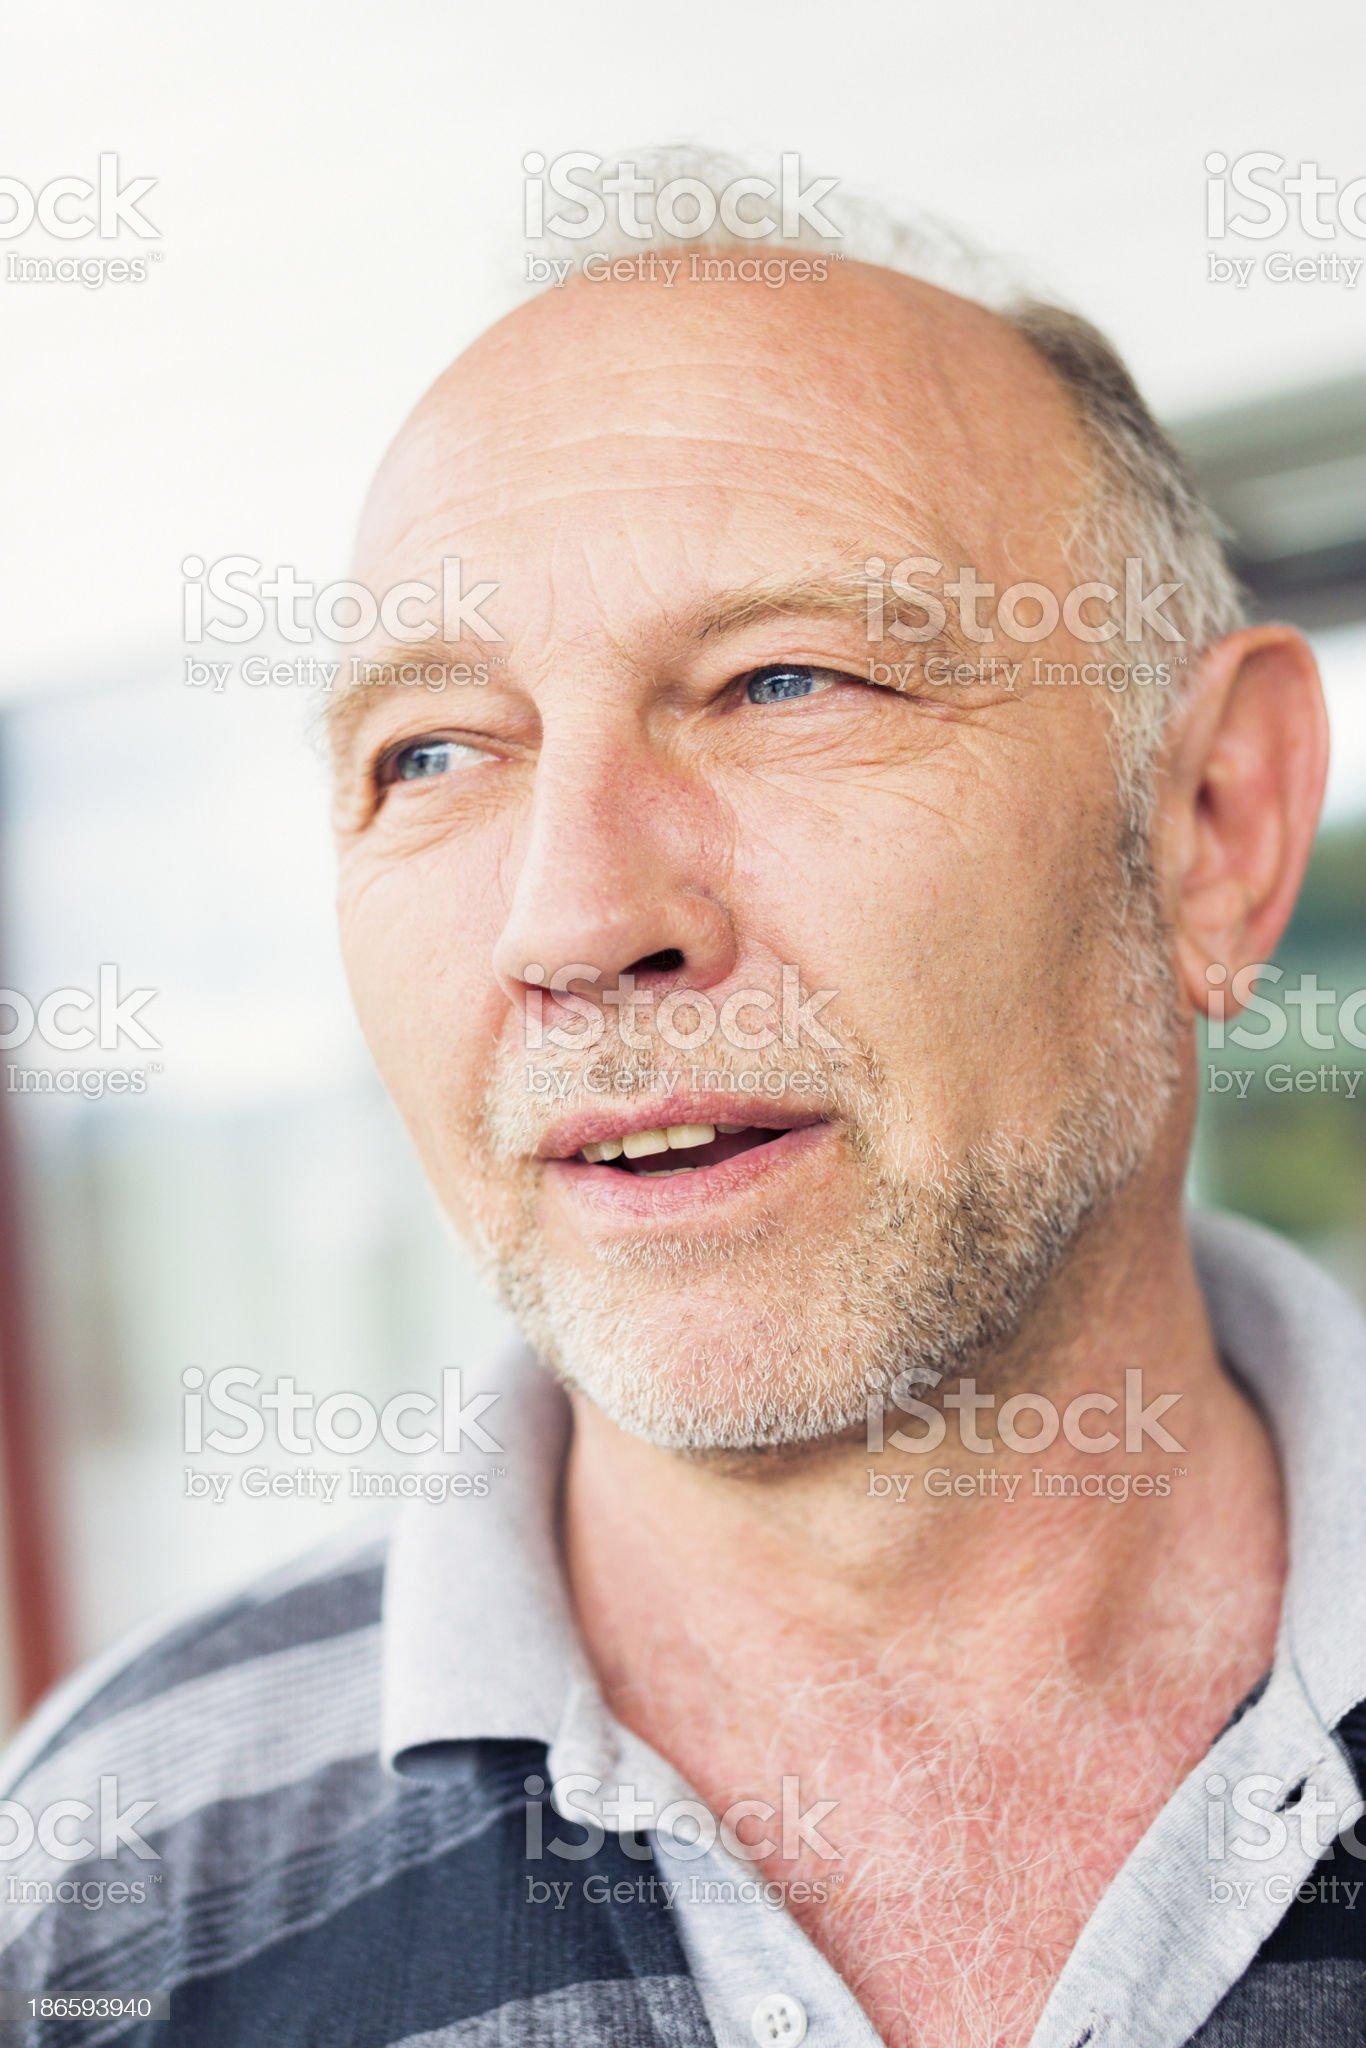 senior man's portrait royalty-free stock photo